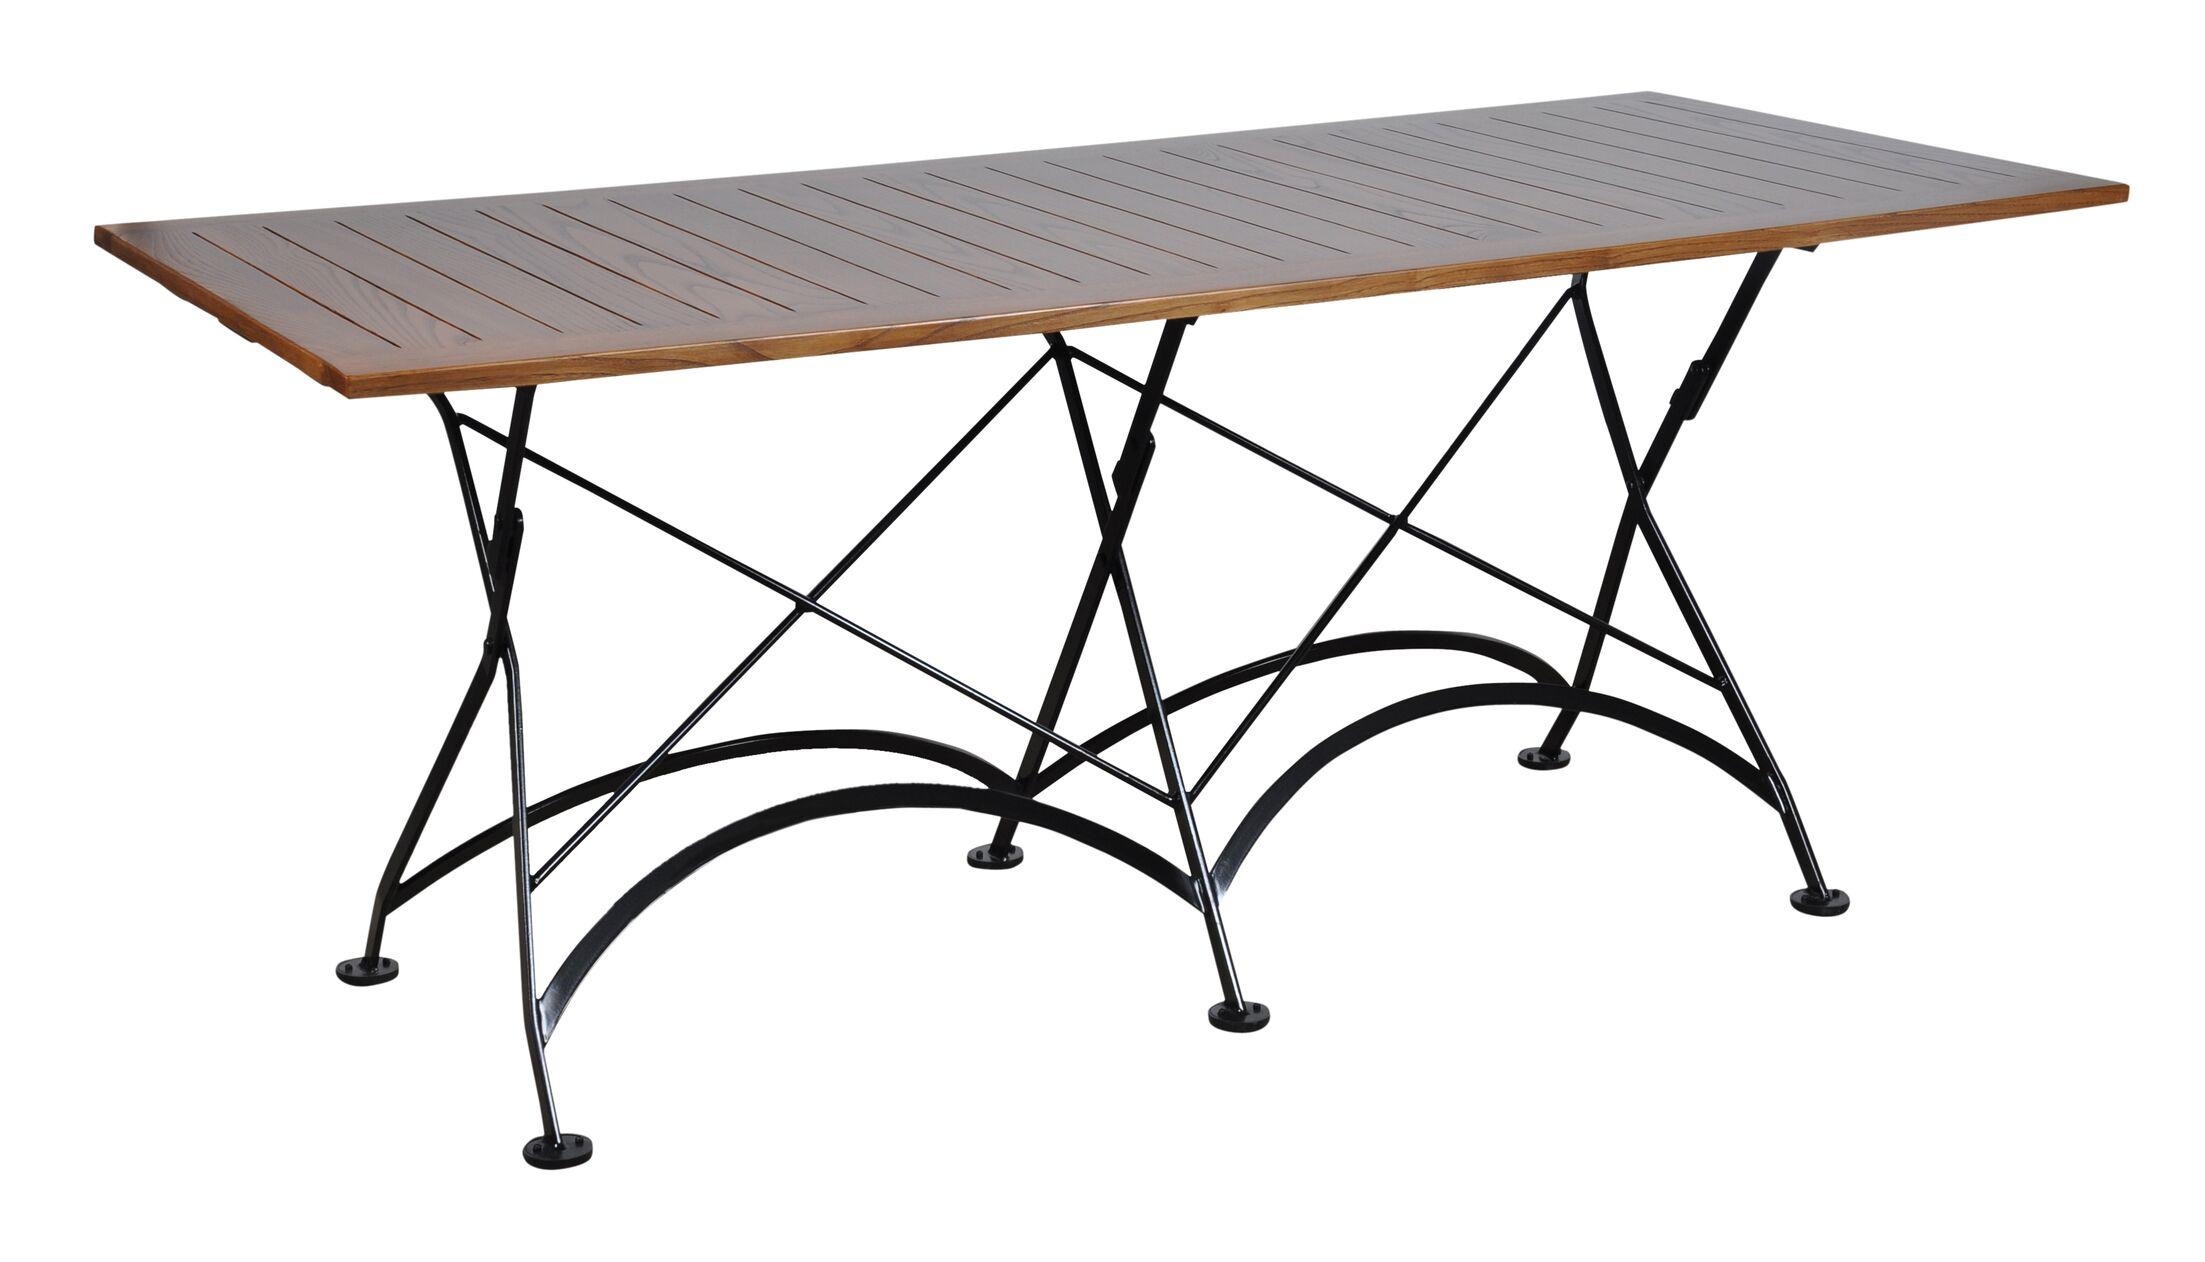 European Café Folding Dining Table Color: Chestnut